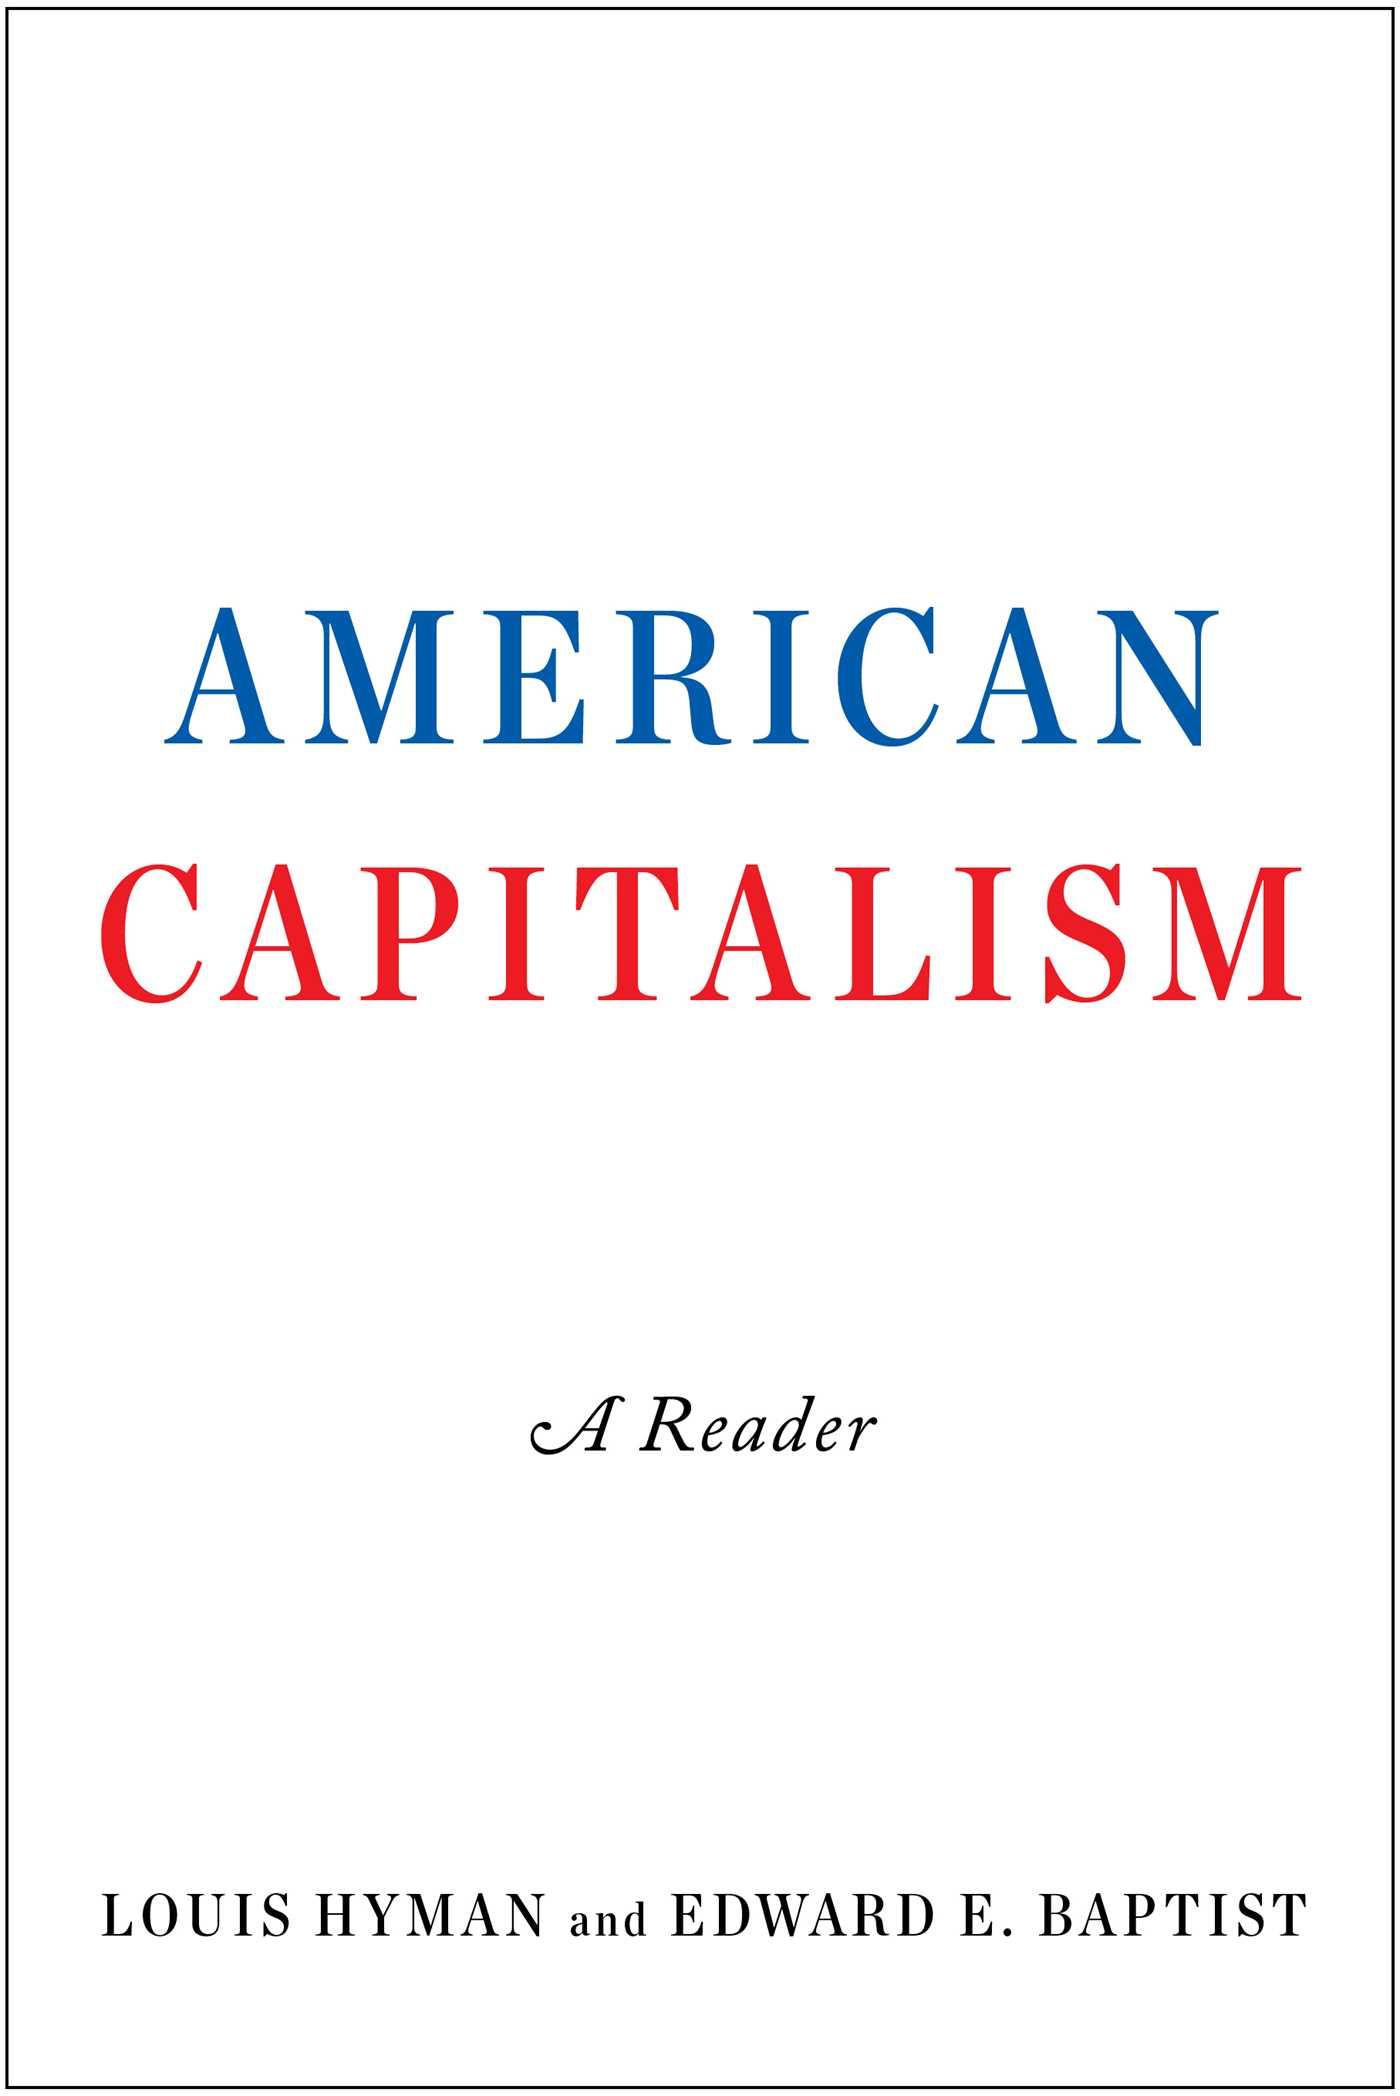 Download Ebook American Capitalism by Louis Hyman Pdf